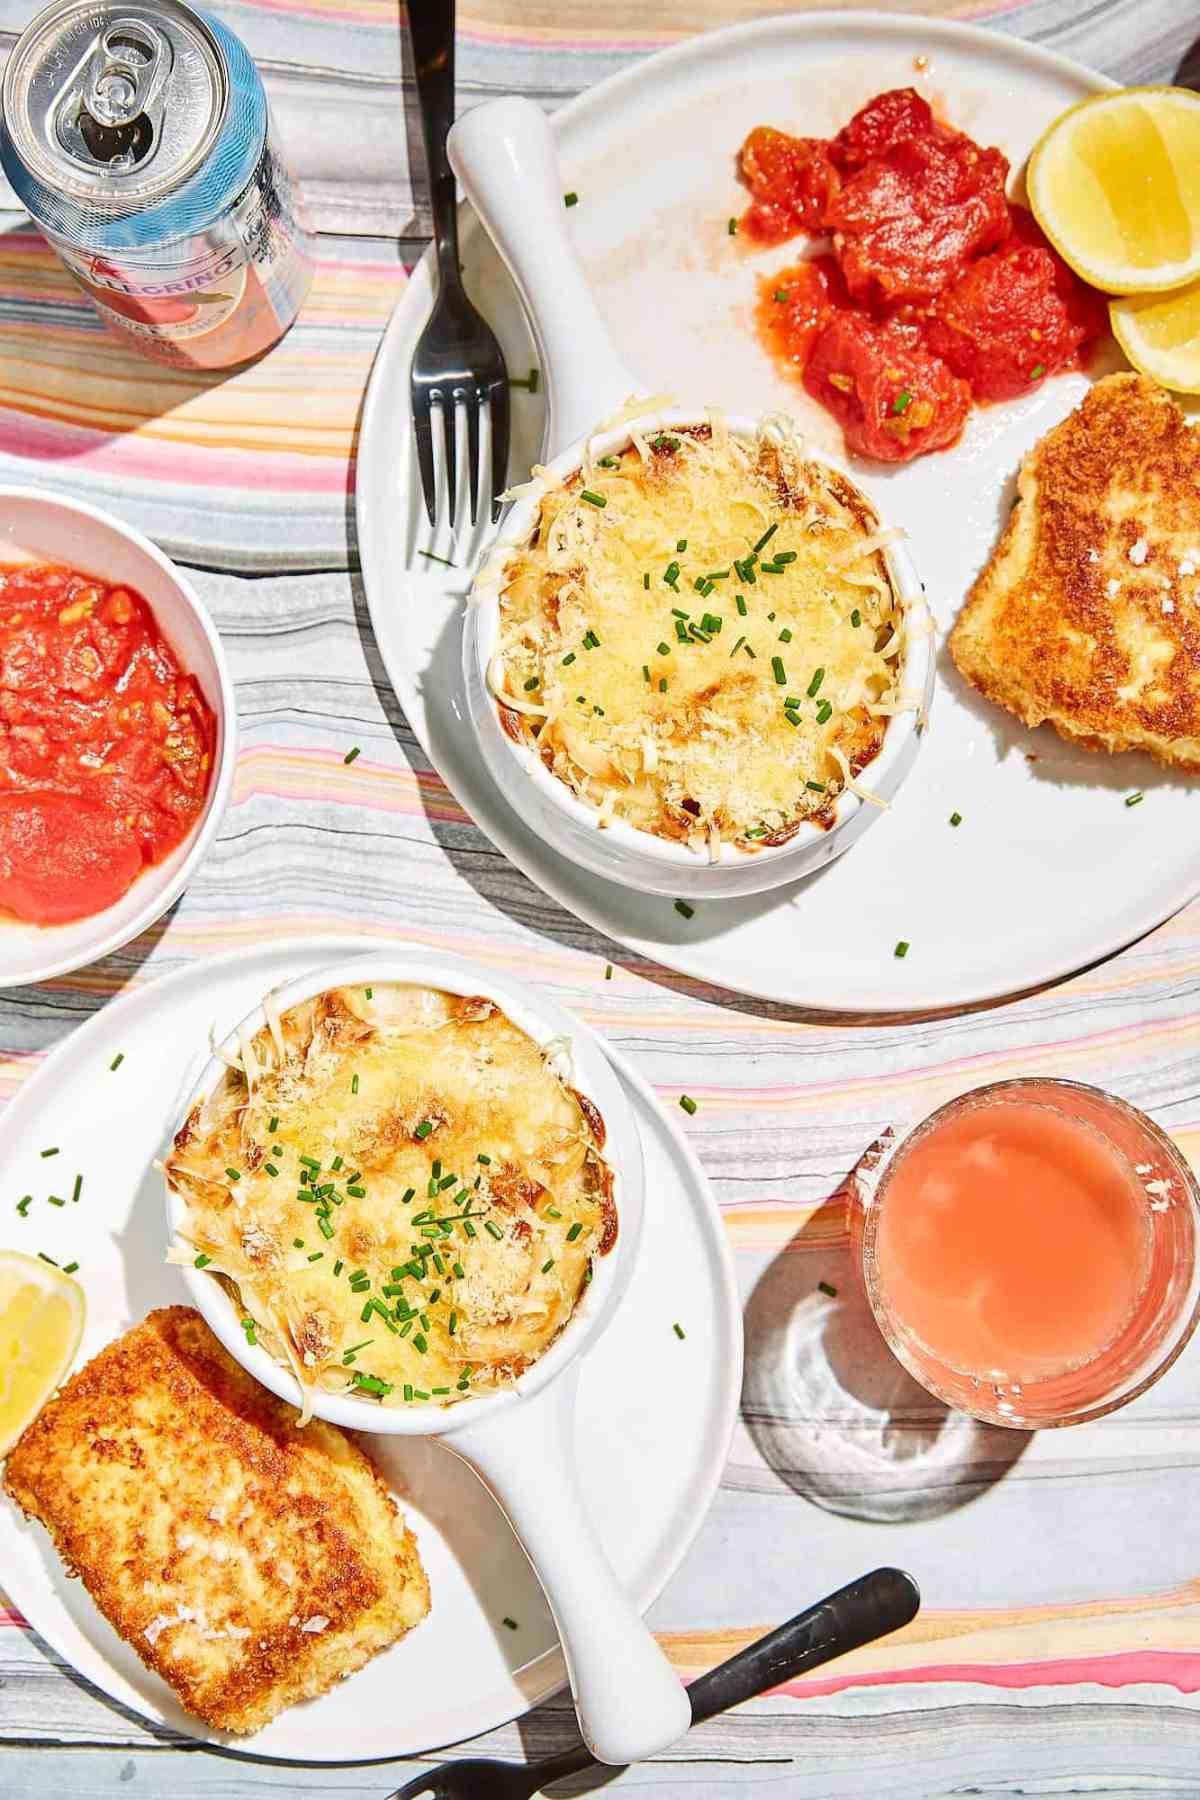 Grandmom's Mac and Cheese